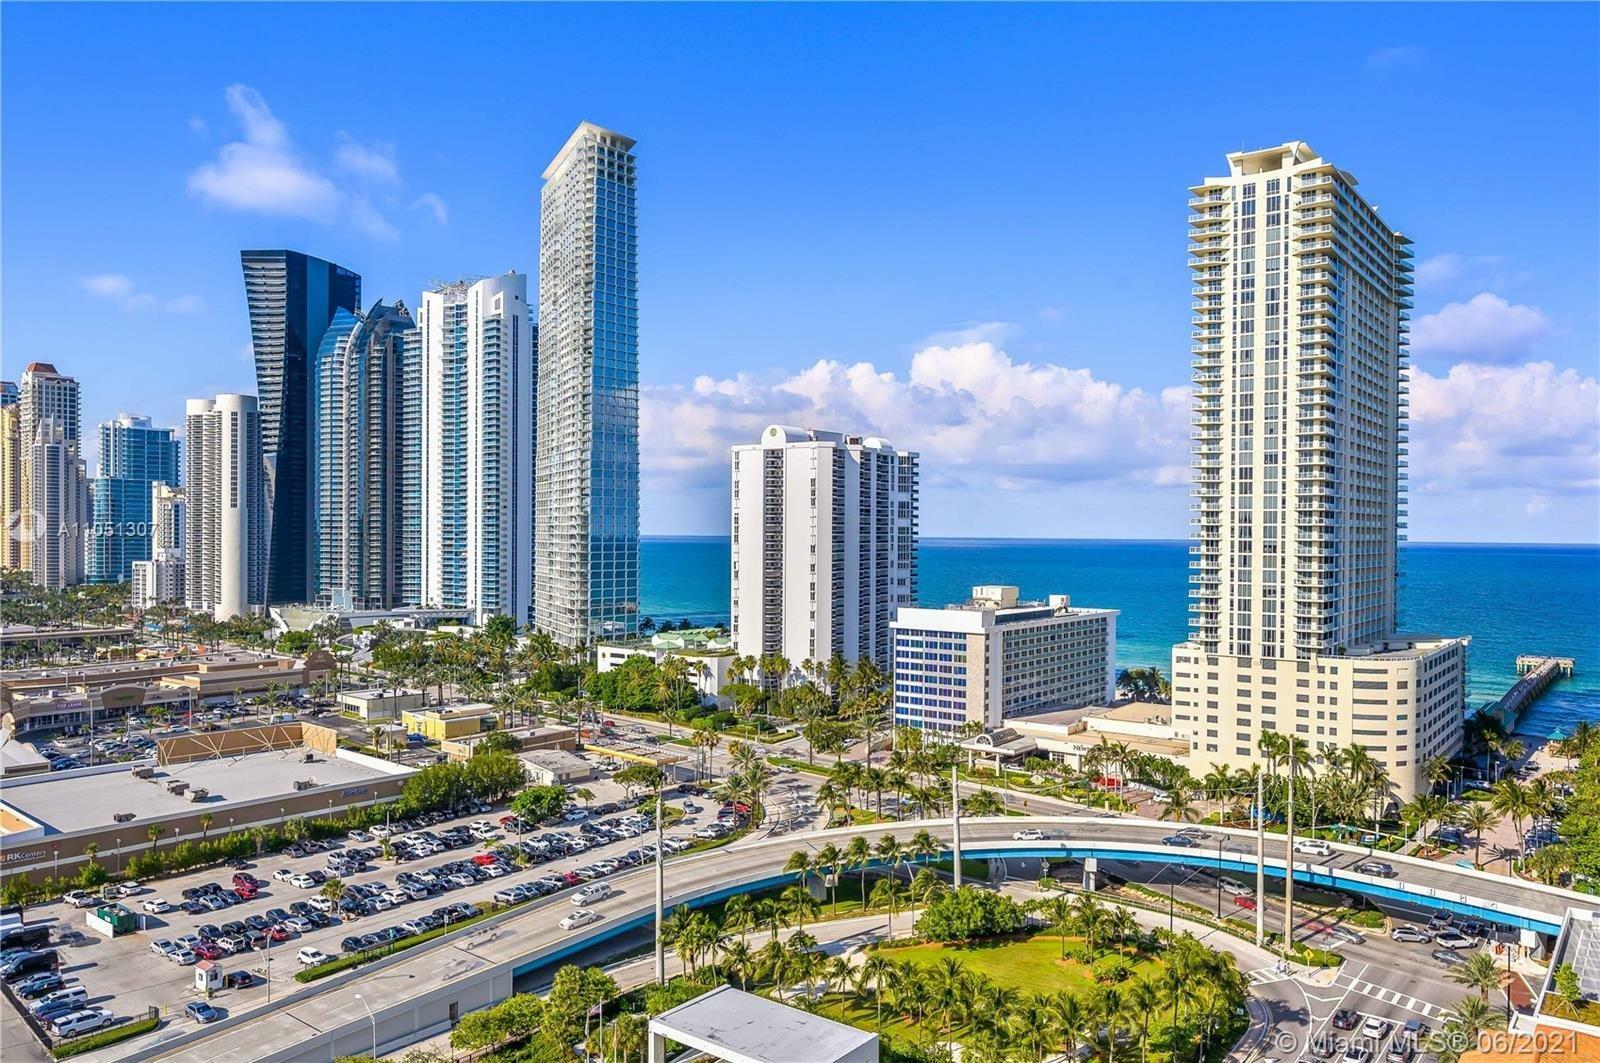 Condo in Golden Beach, Florida, United States 1 - 11488933